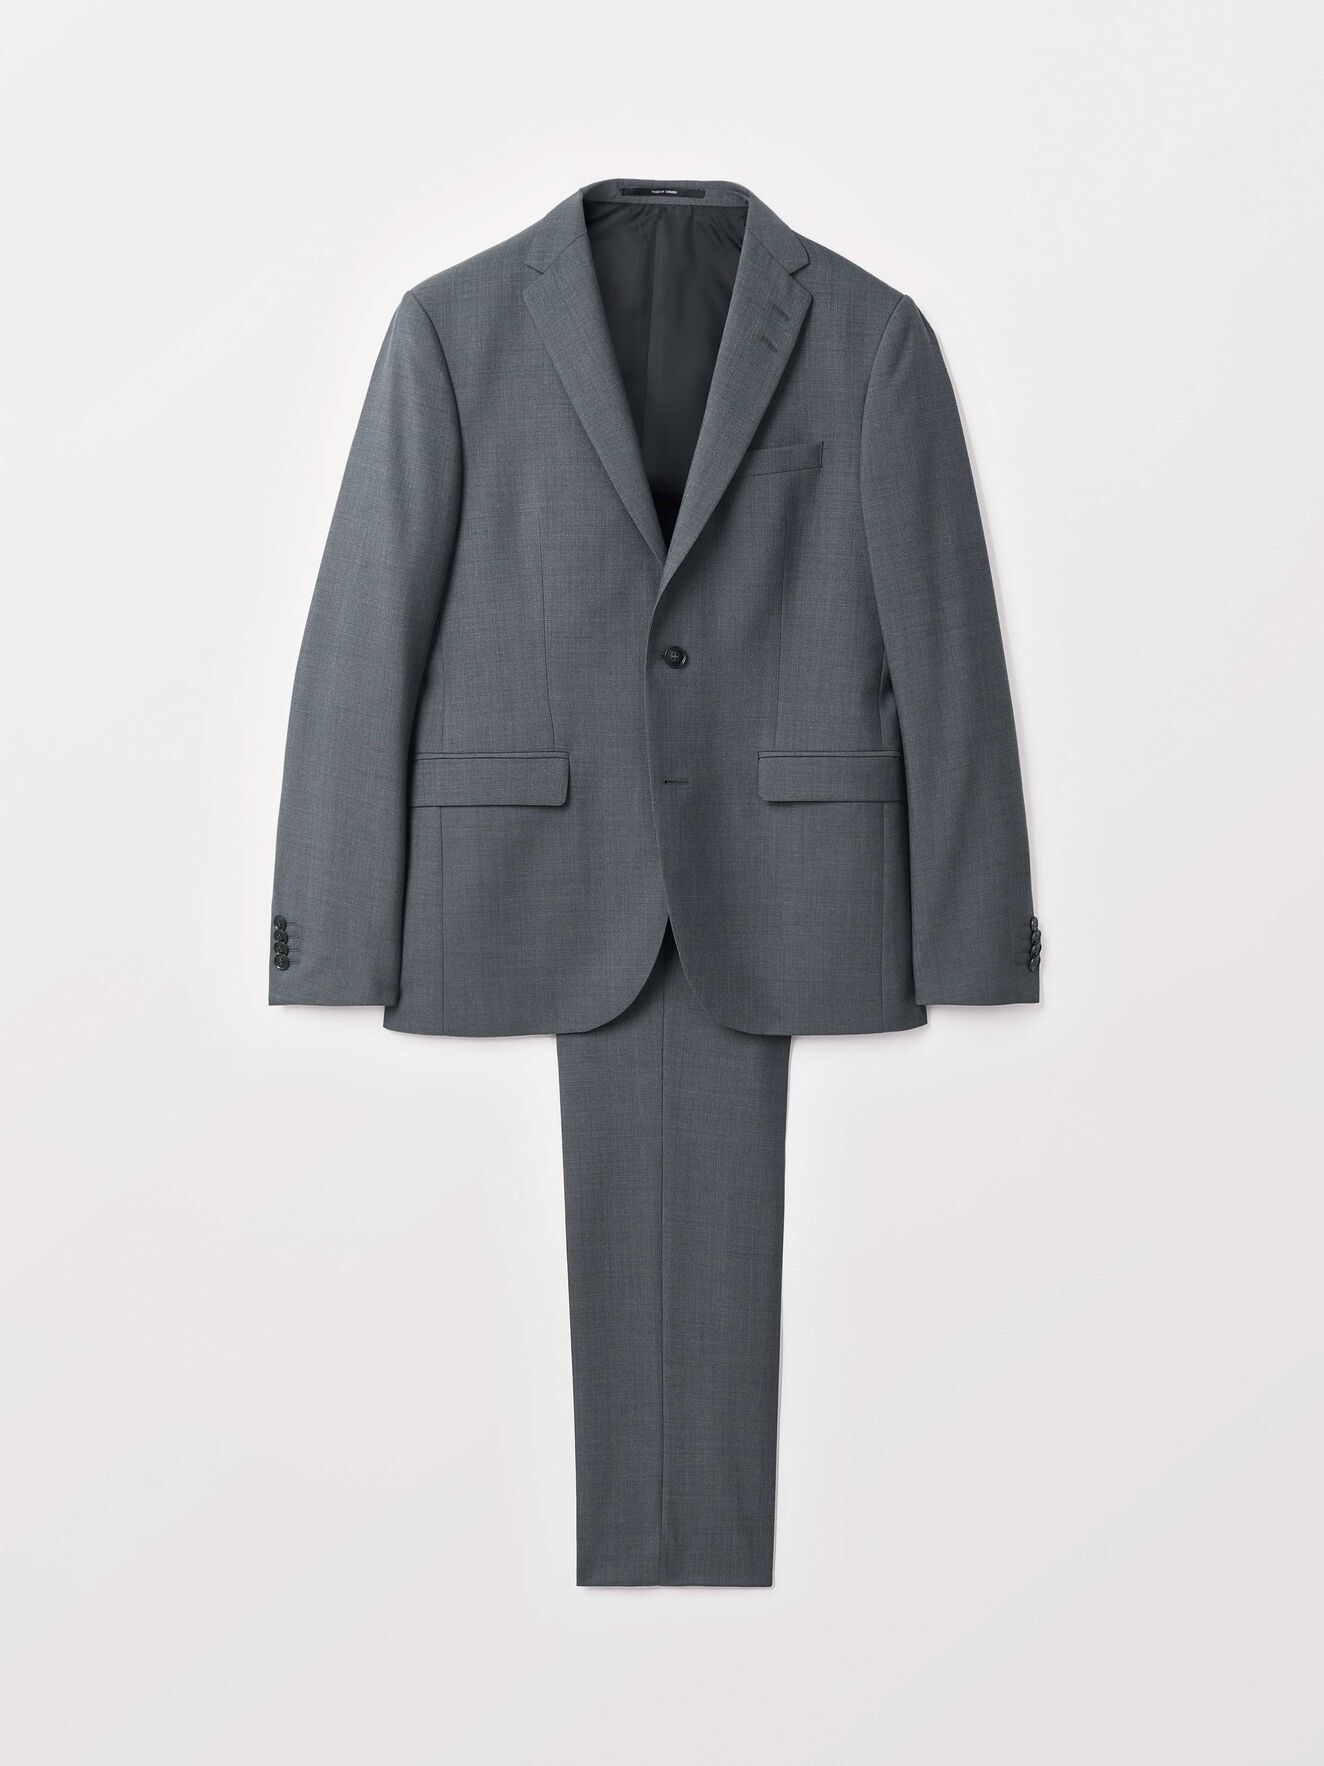 Henrie Suit in Phantom from Tiger of Sweden